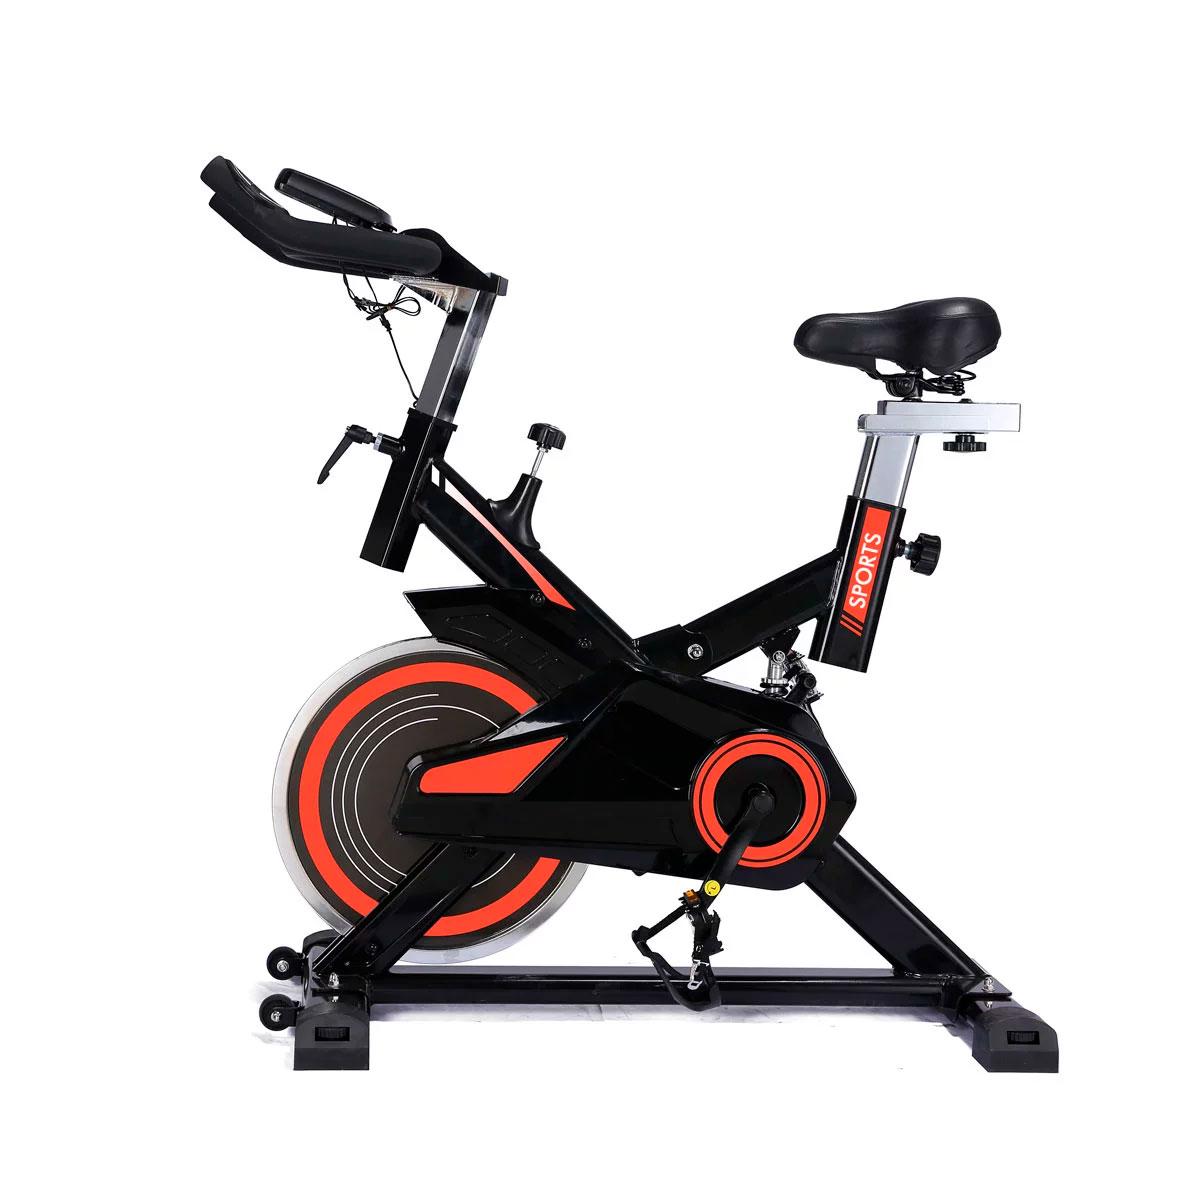 Bicicleta Spinning Freecycle 7800 - Preto E Laranja